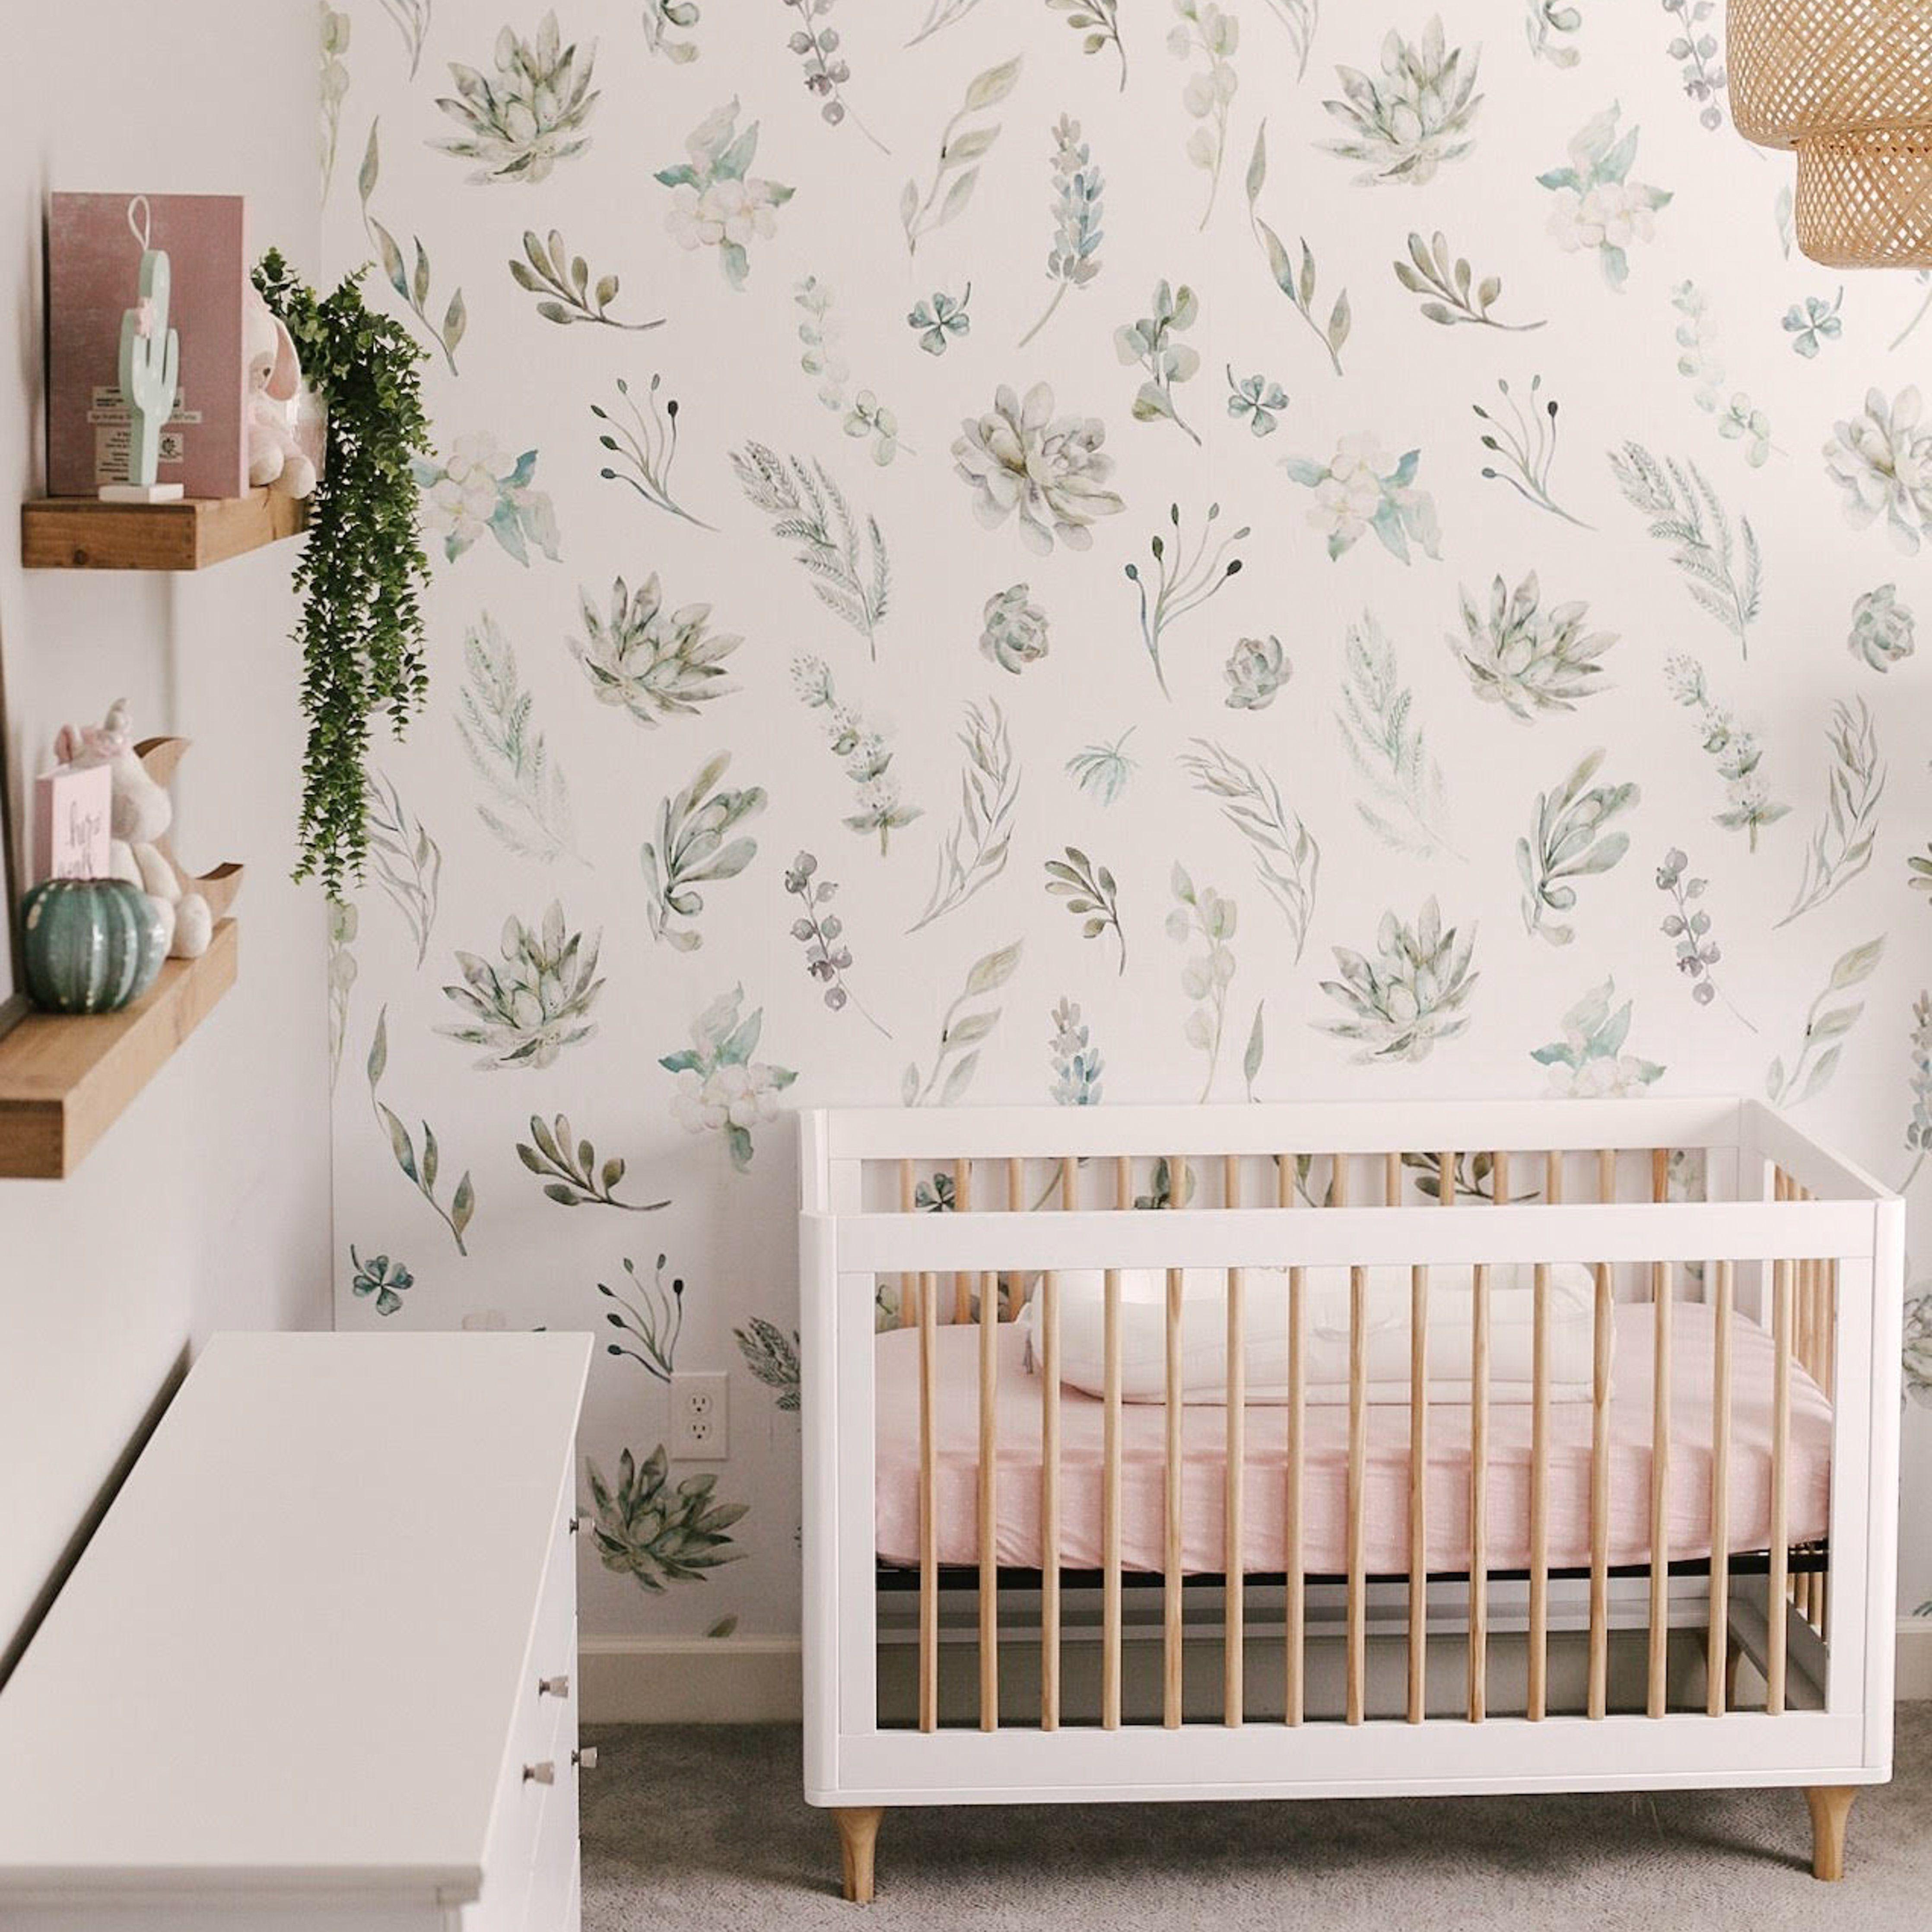 Blush Nursery With Neutral Textures: Nursery Wallpaper